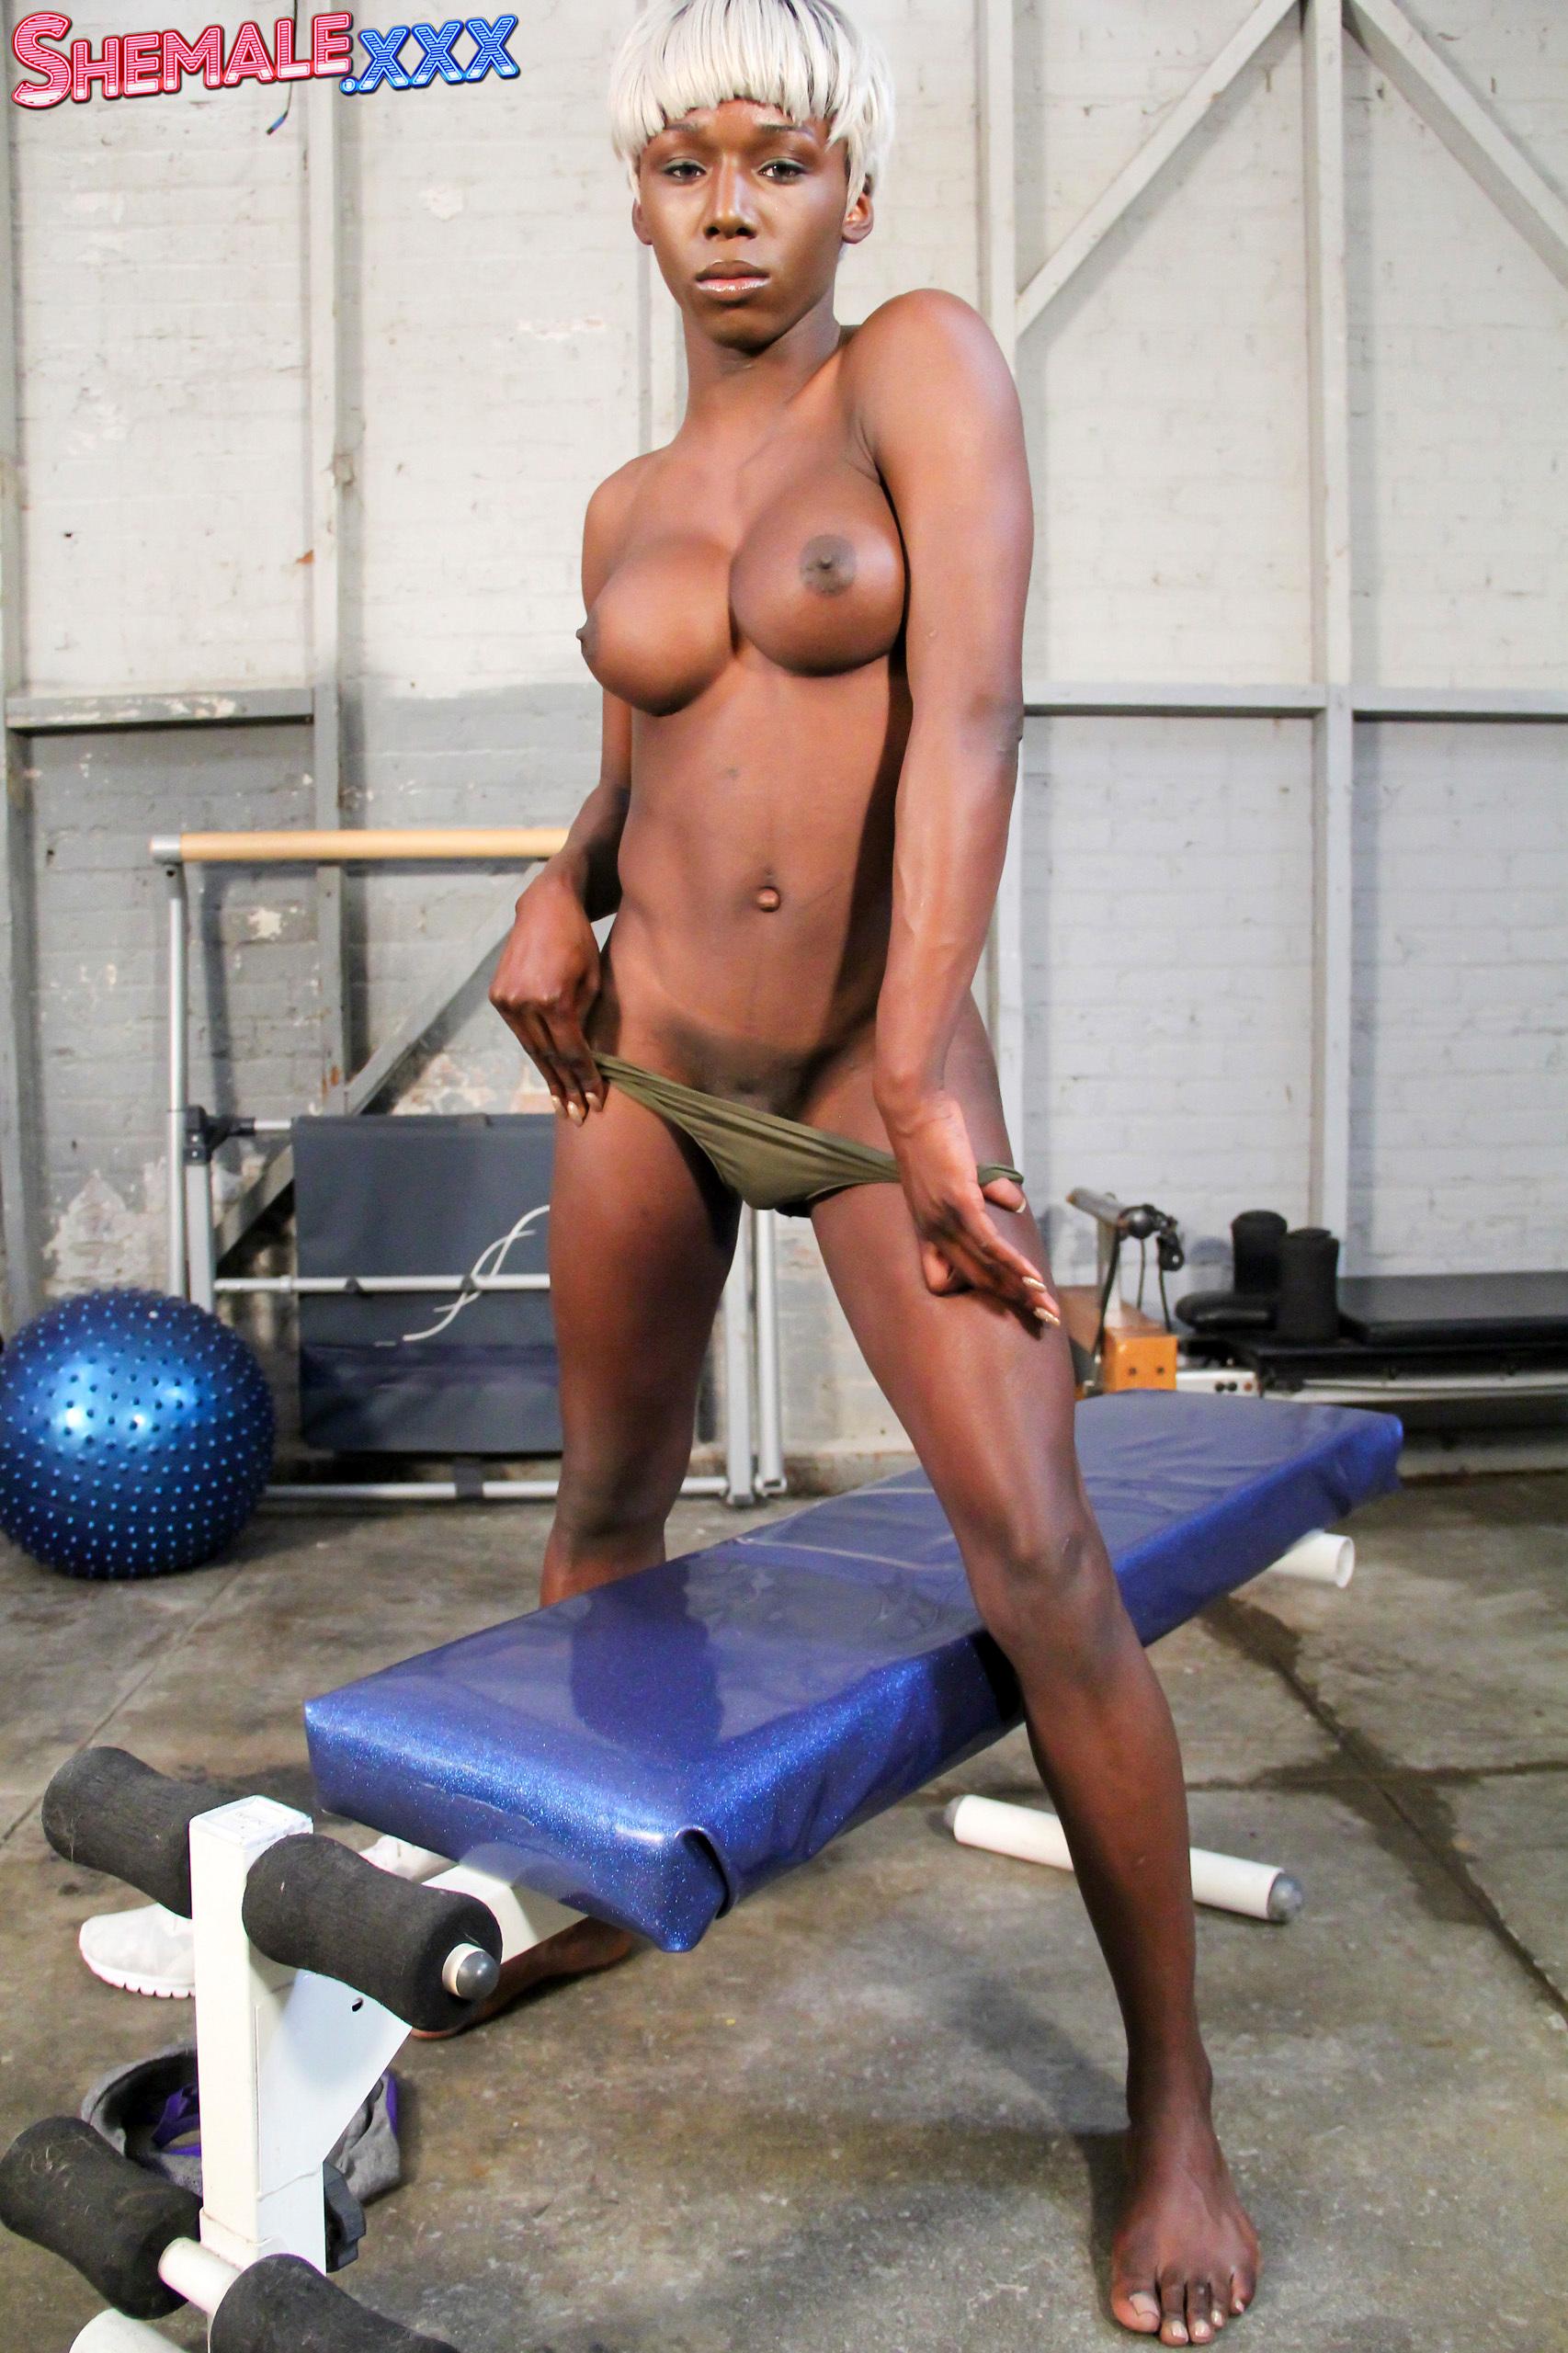 Kendall Dreams, Your Nasty Gym Buddy!